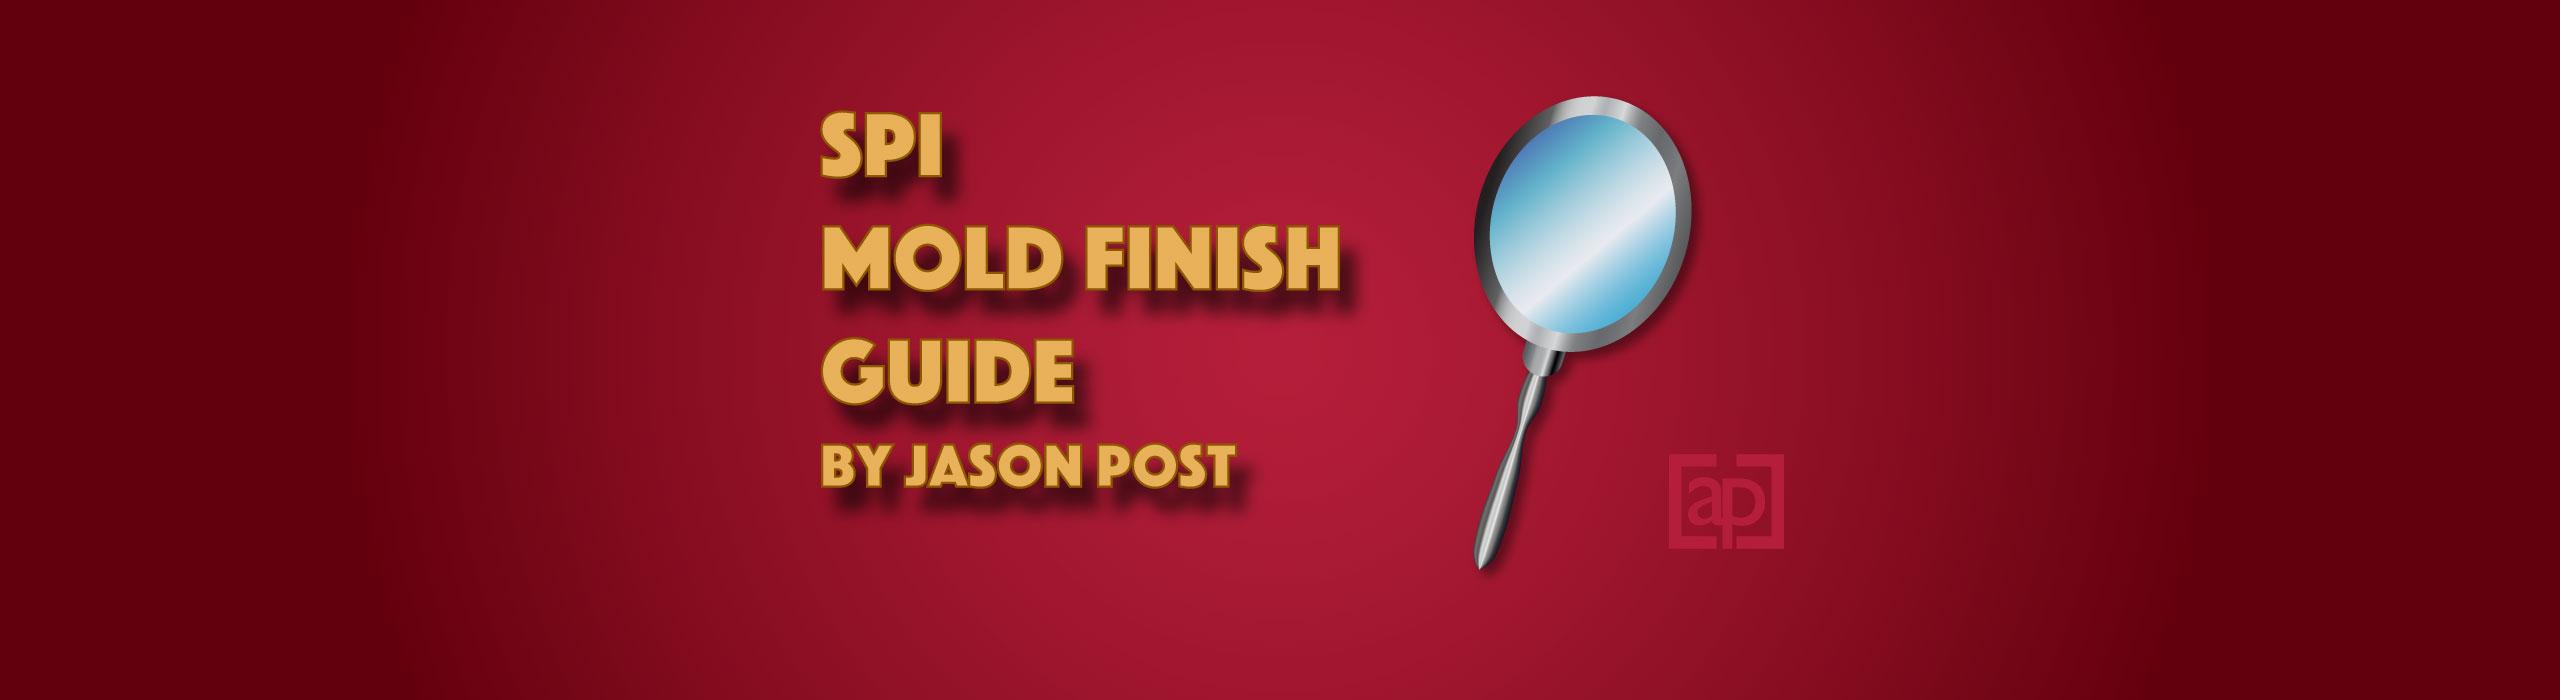 SPI-Mold-Finish-Guide_Title